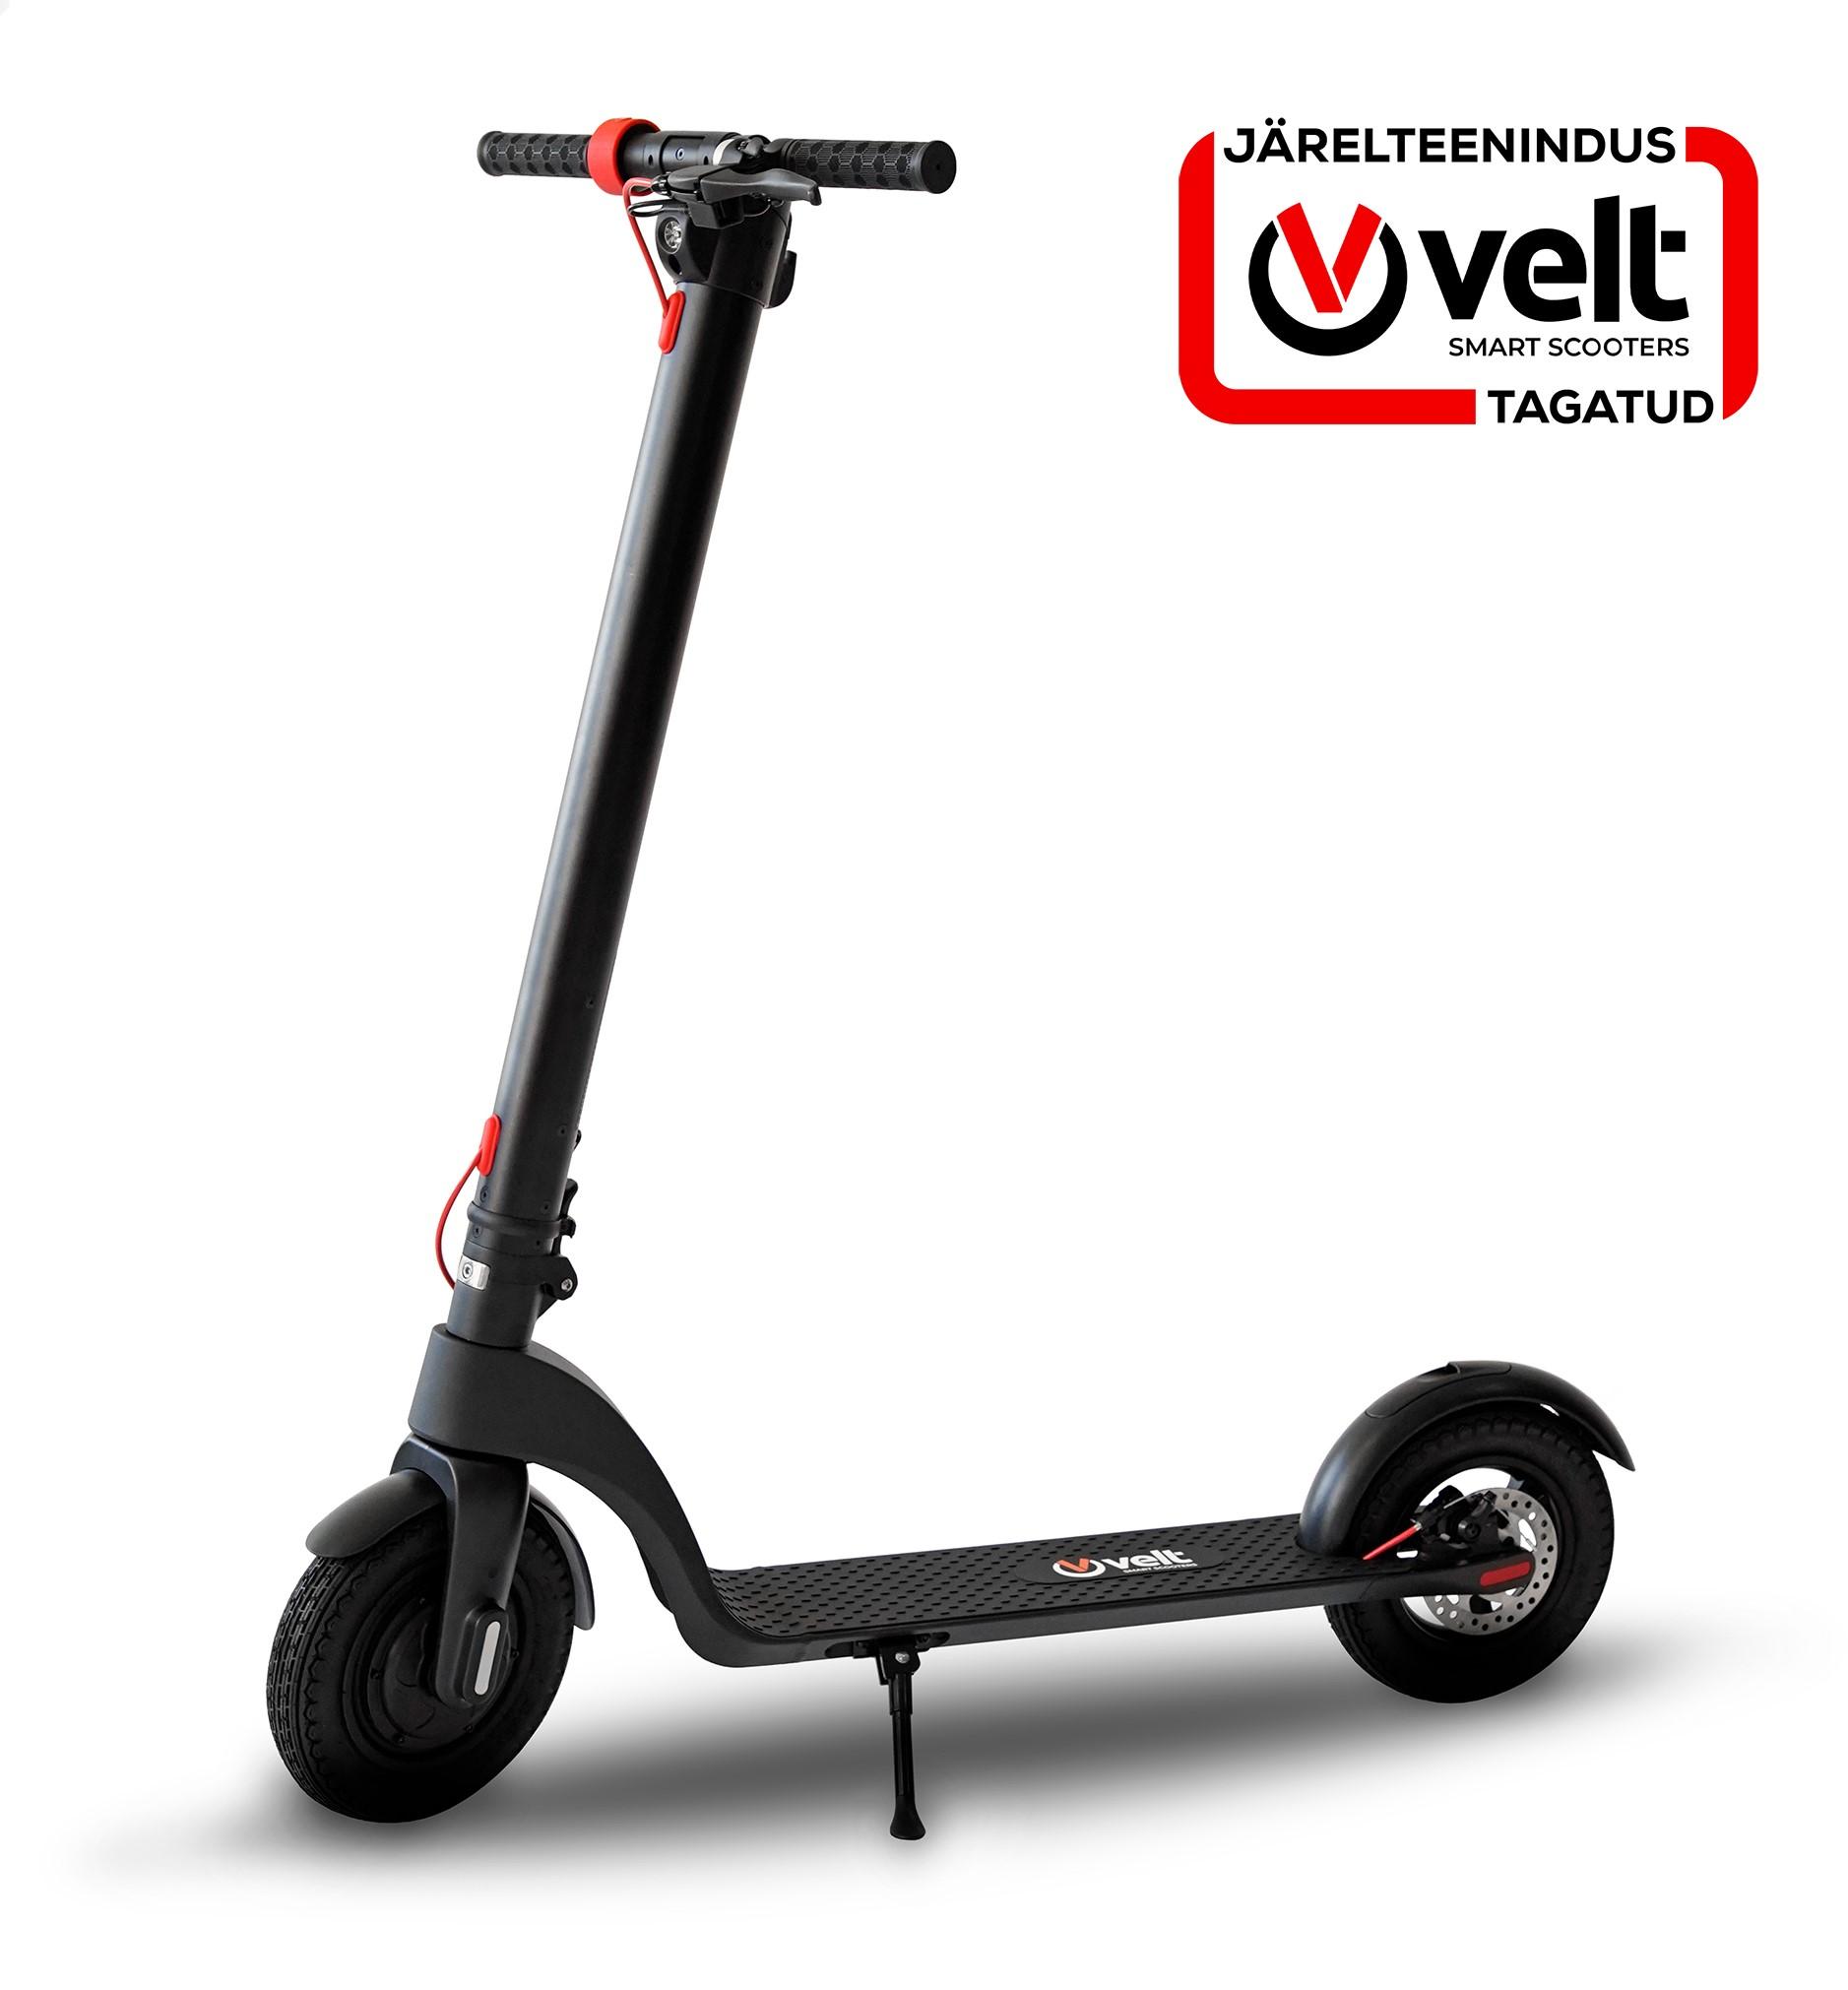 Velt Smart Scooter X7 elektritõukeratas